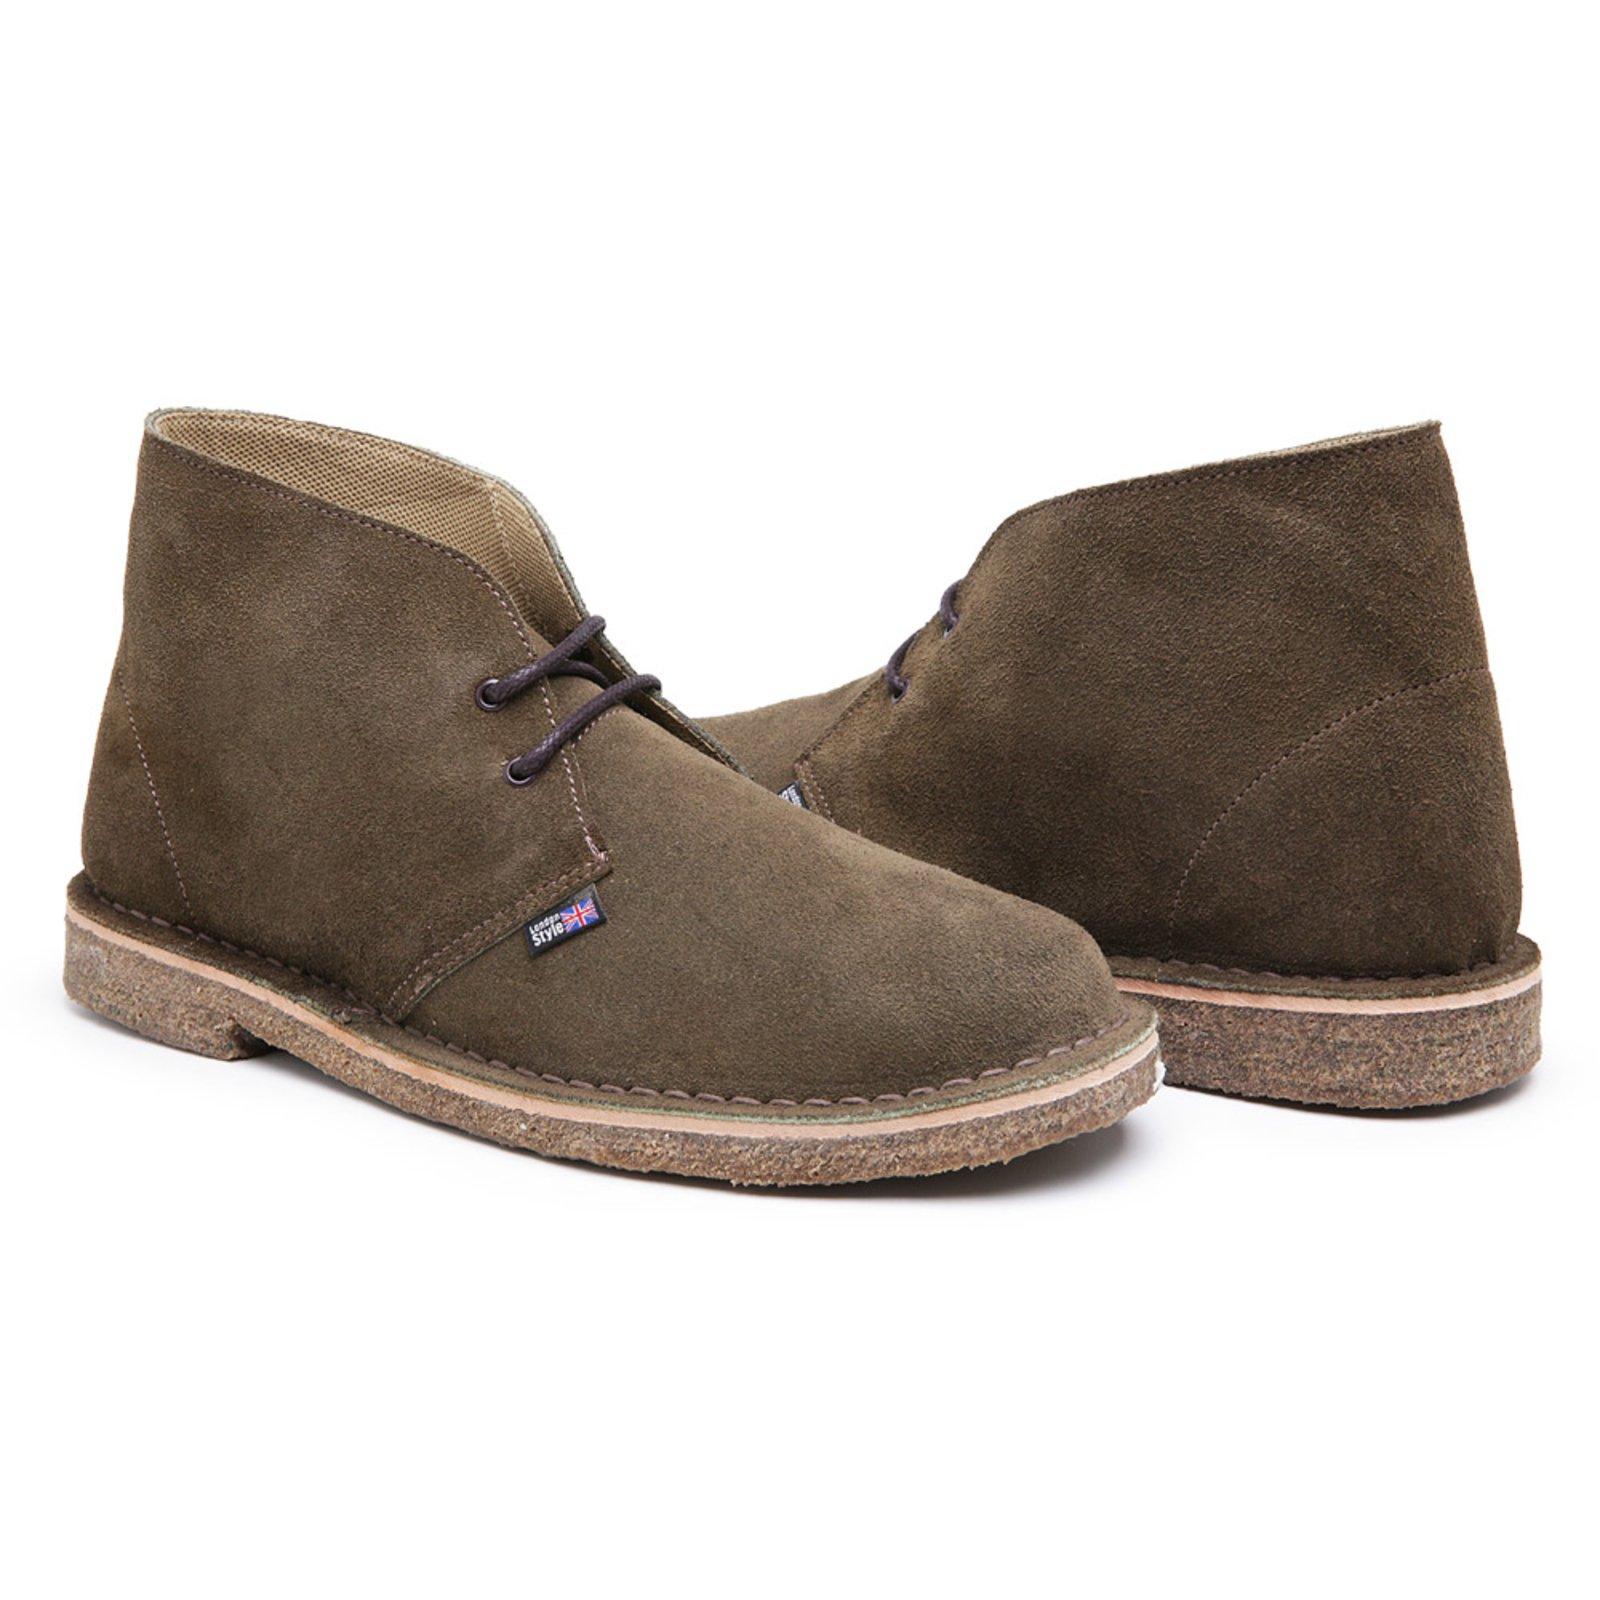 desert-boot-london-style-bege